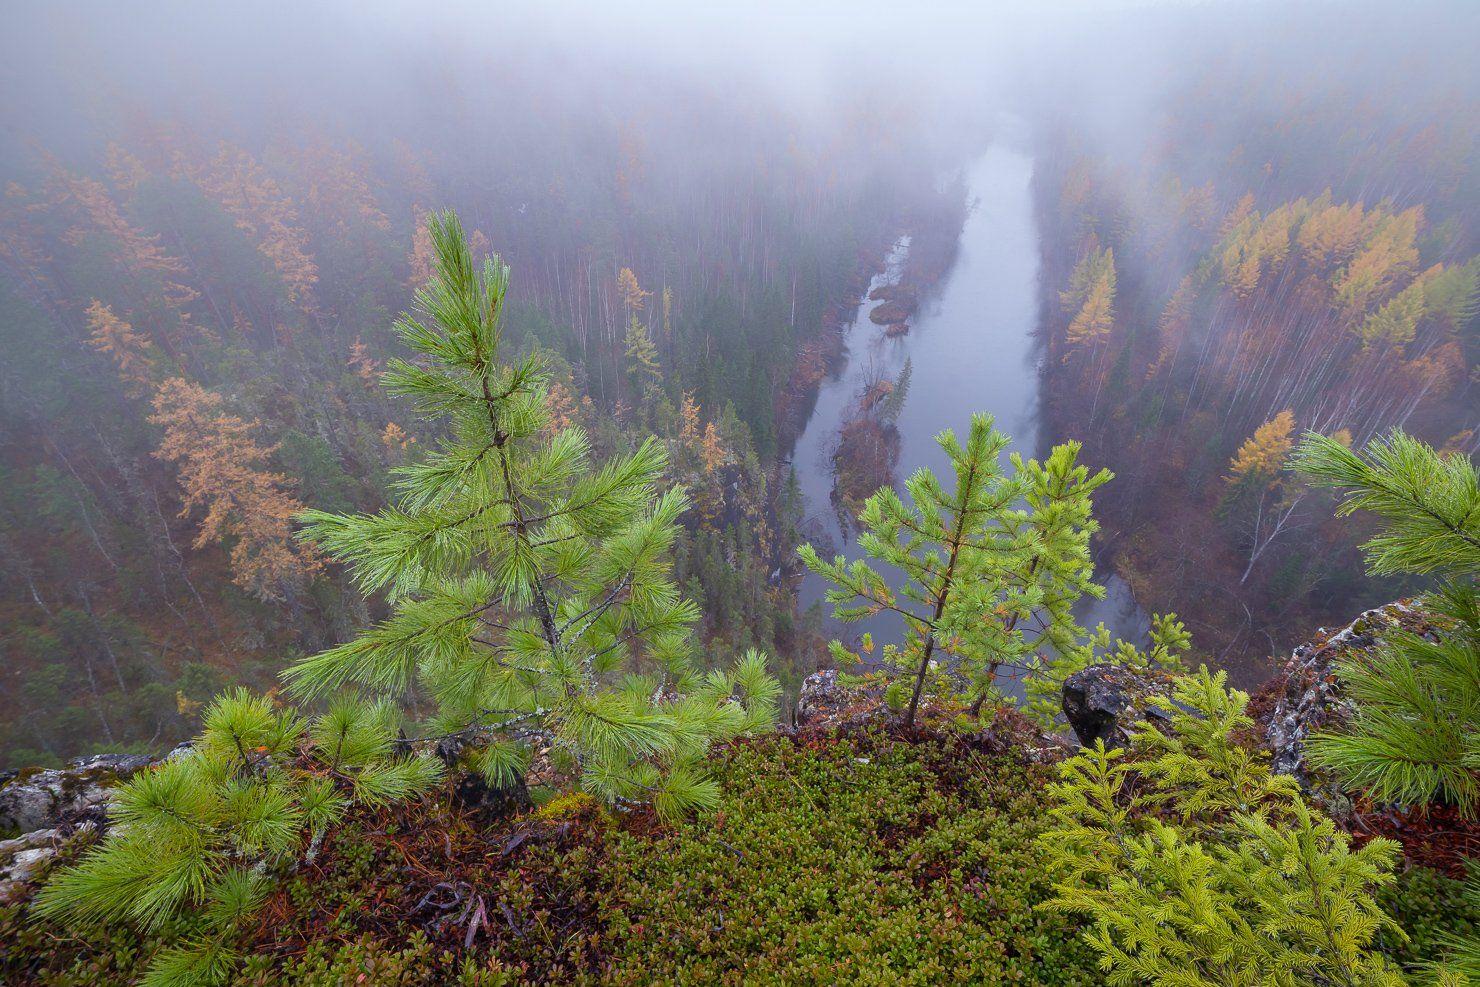 осень, урал, лес, Екатерина Васягина